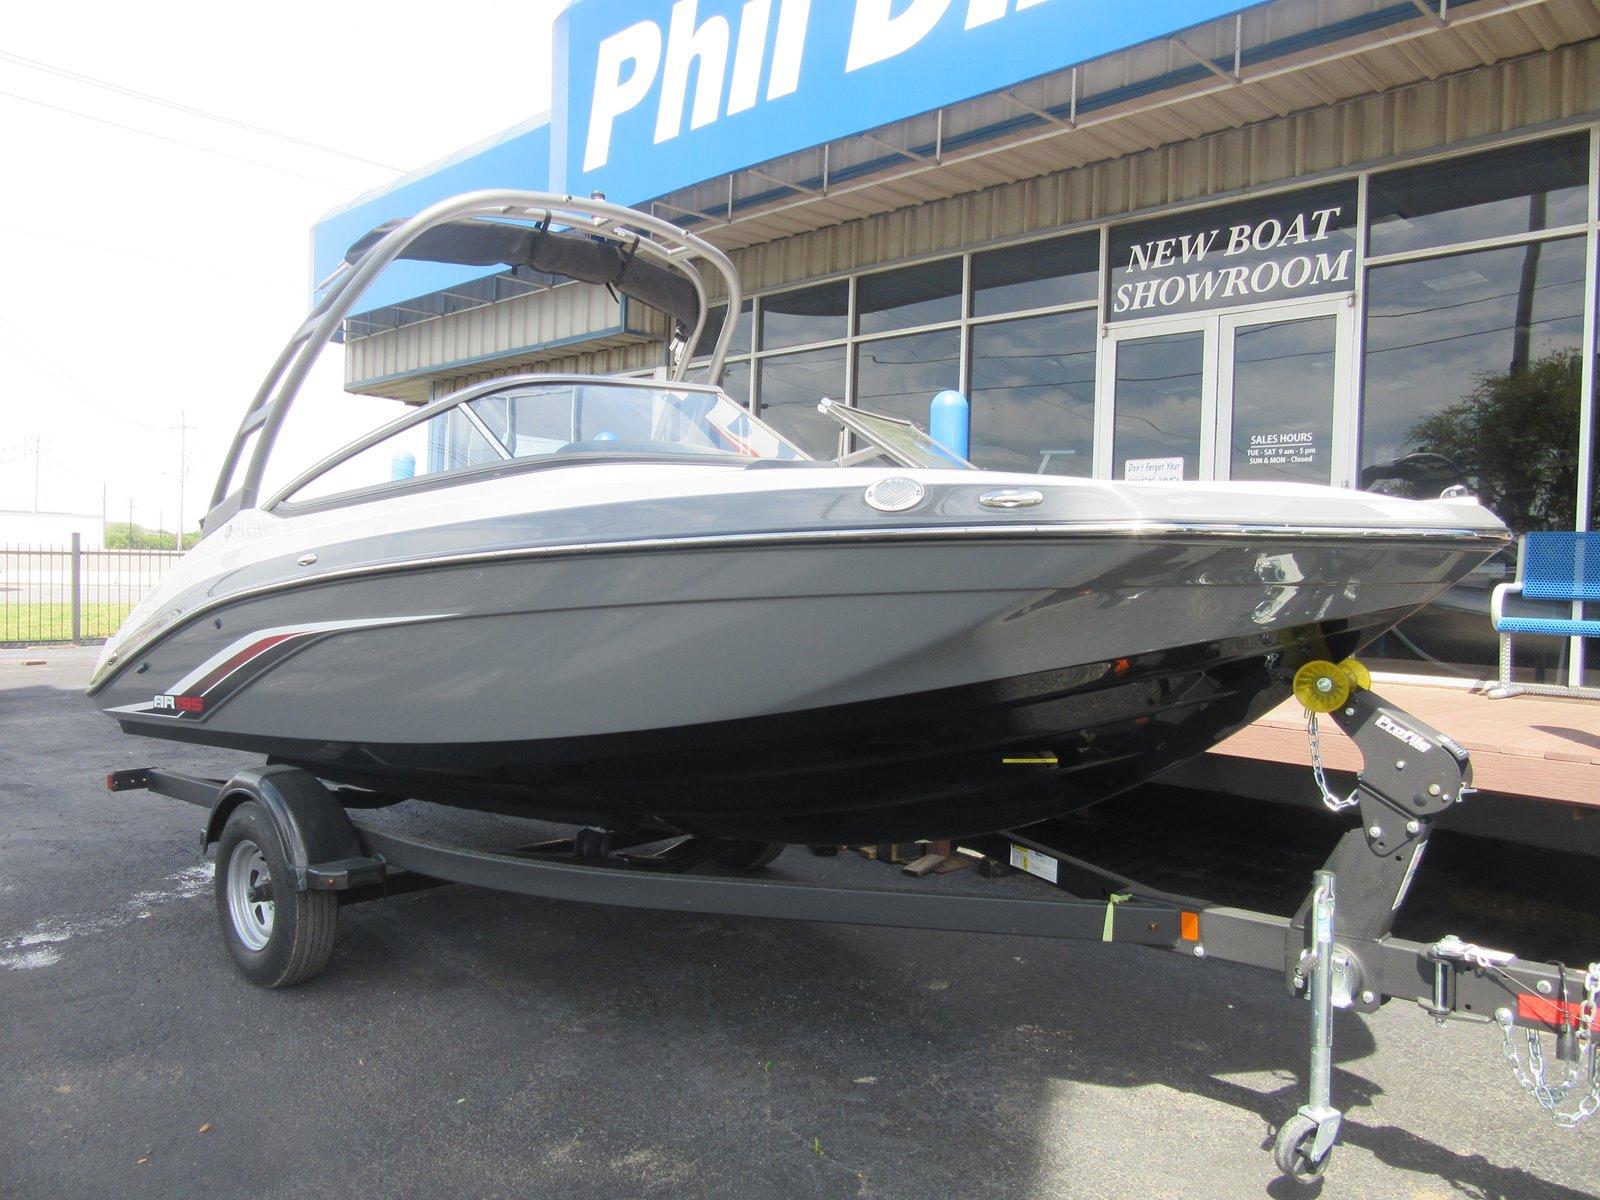 2019 YAMAHA AR195 - Phil Dill Boats - N37446 - Phil Dill Boats